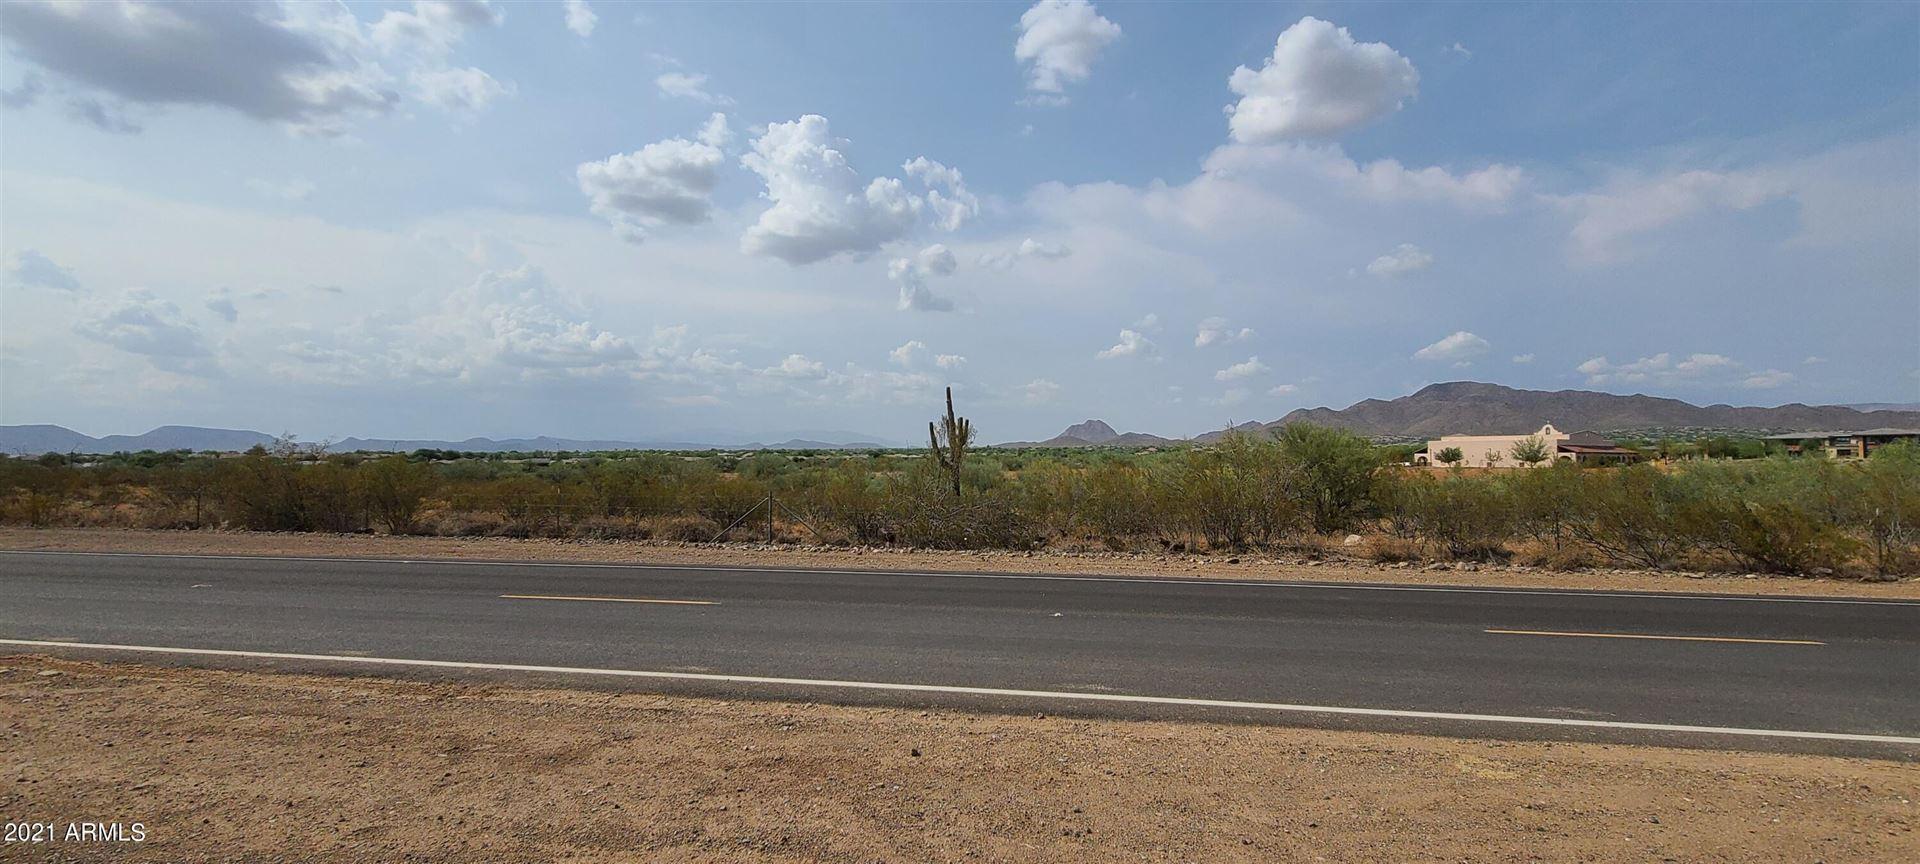 Photo of 2900 W Desert Hills Drive, New River, AZ 85086 (MLS # 6268804)